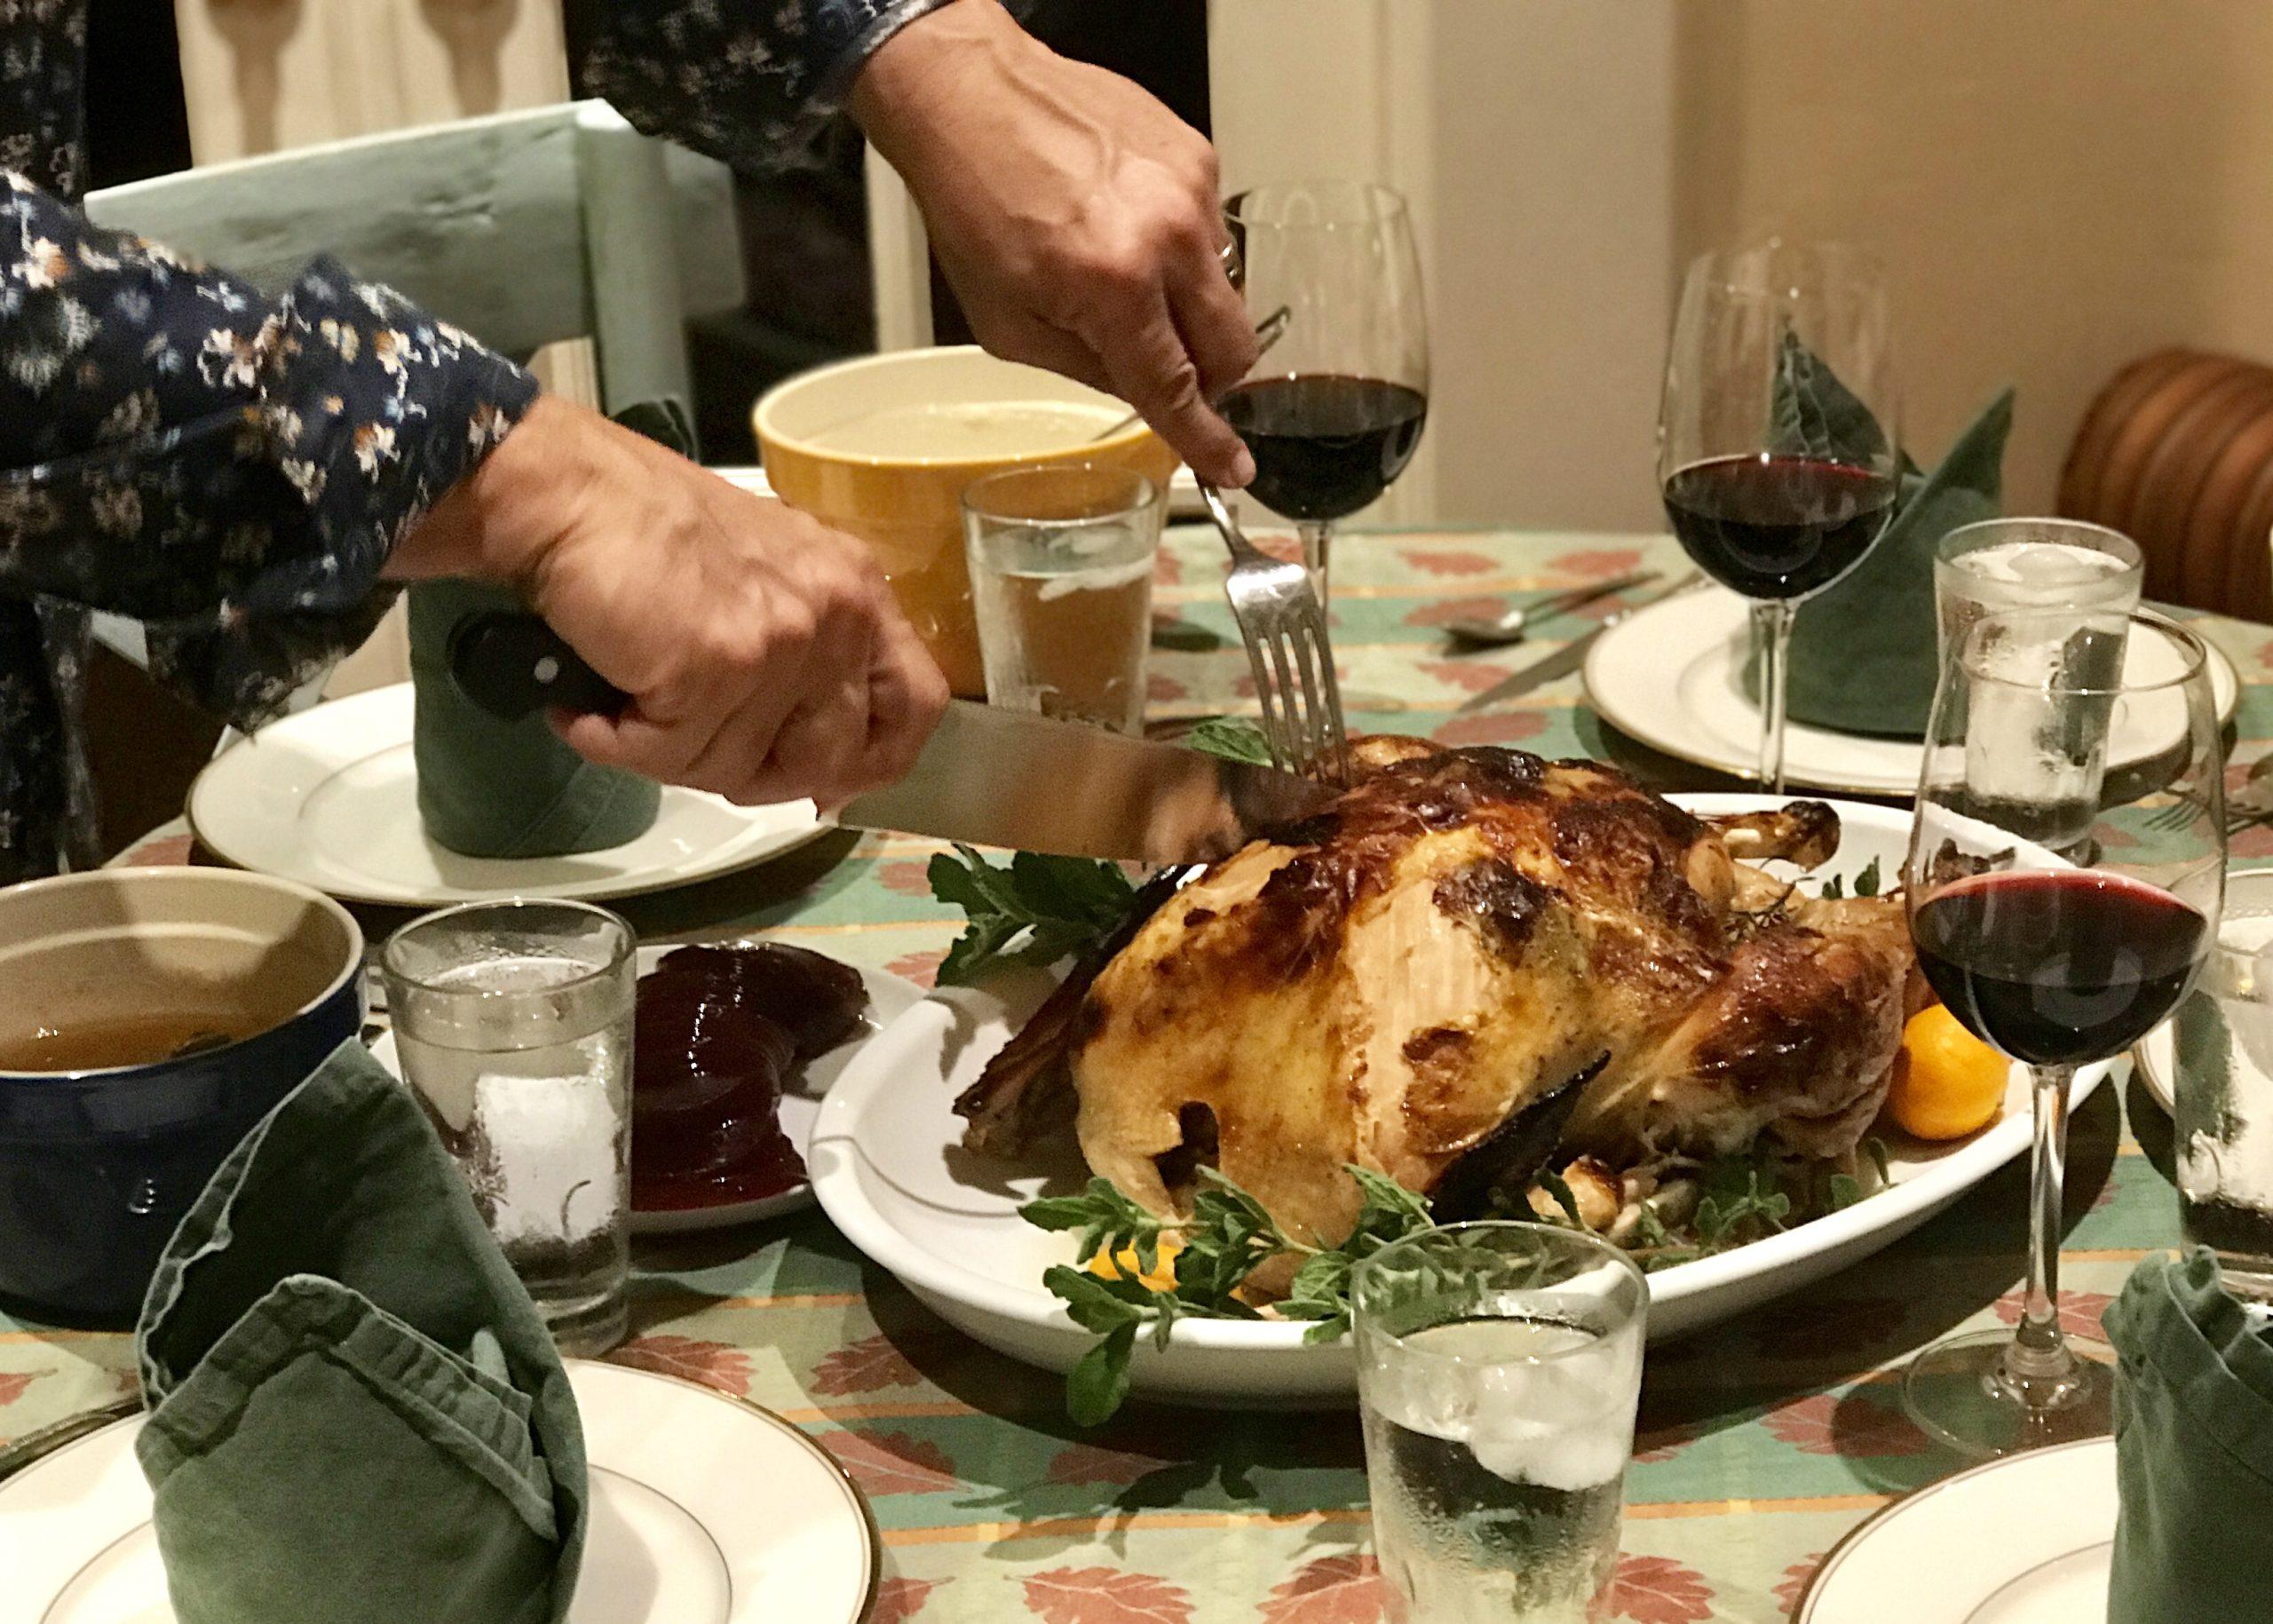 Man carves turkey at Thanksgiving dinner table